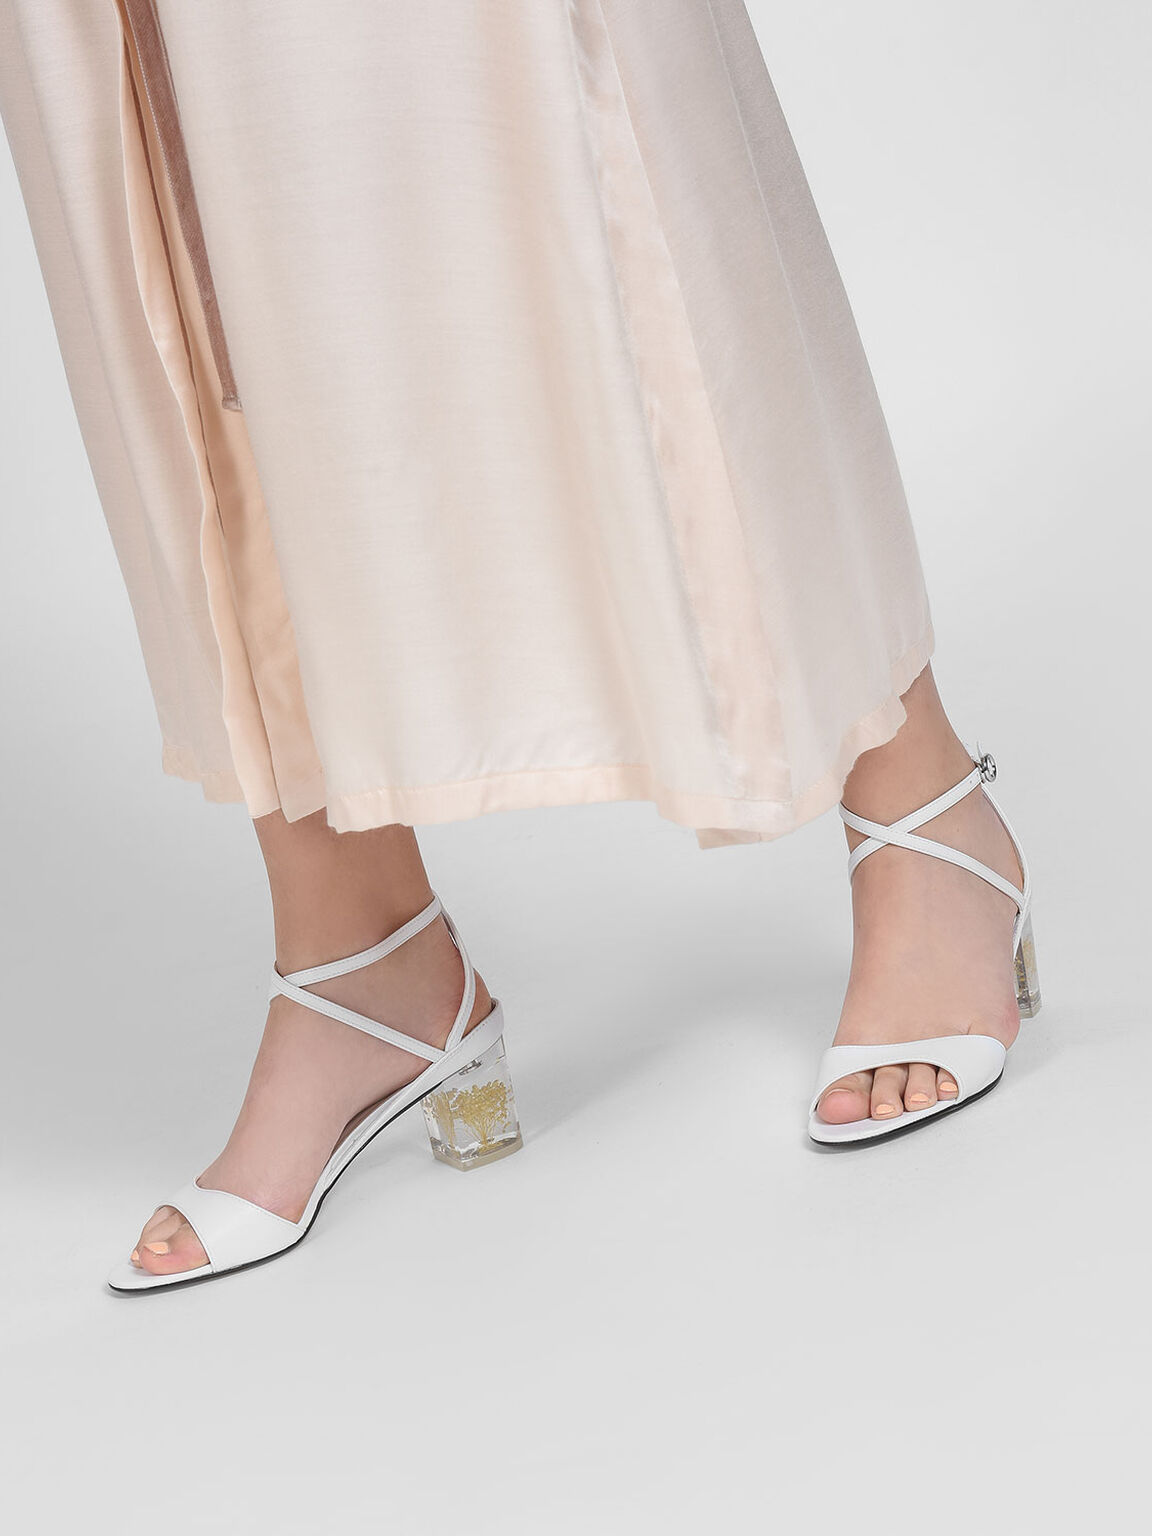 Floral Lucite Heel Sandals, White, hi-res